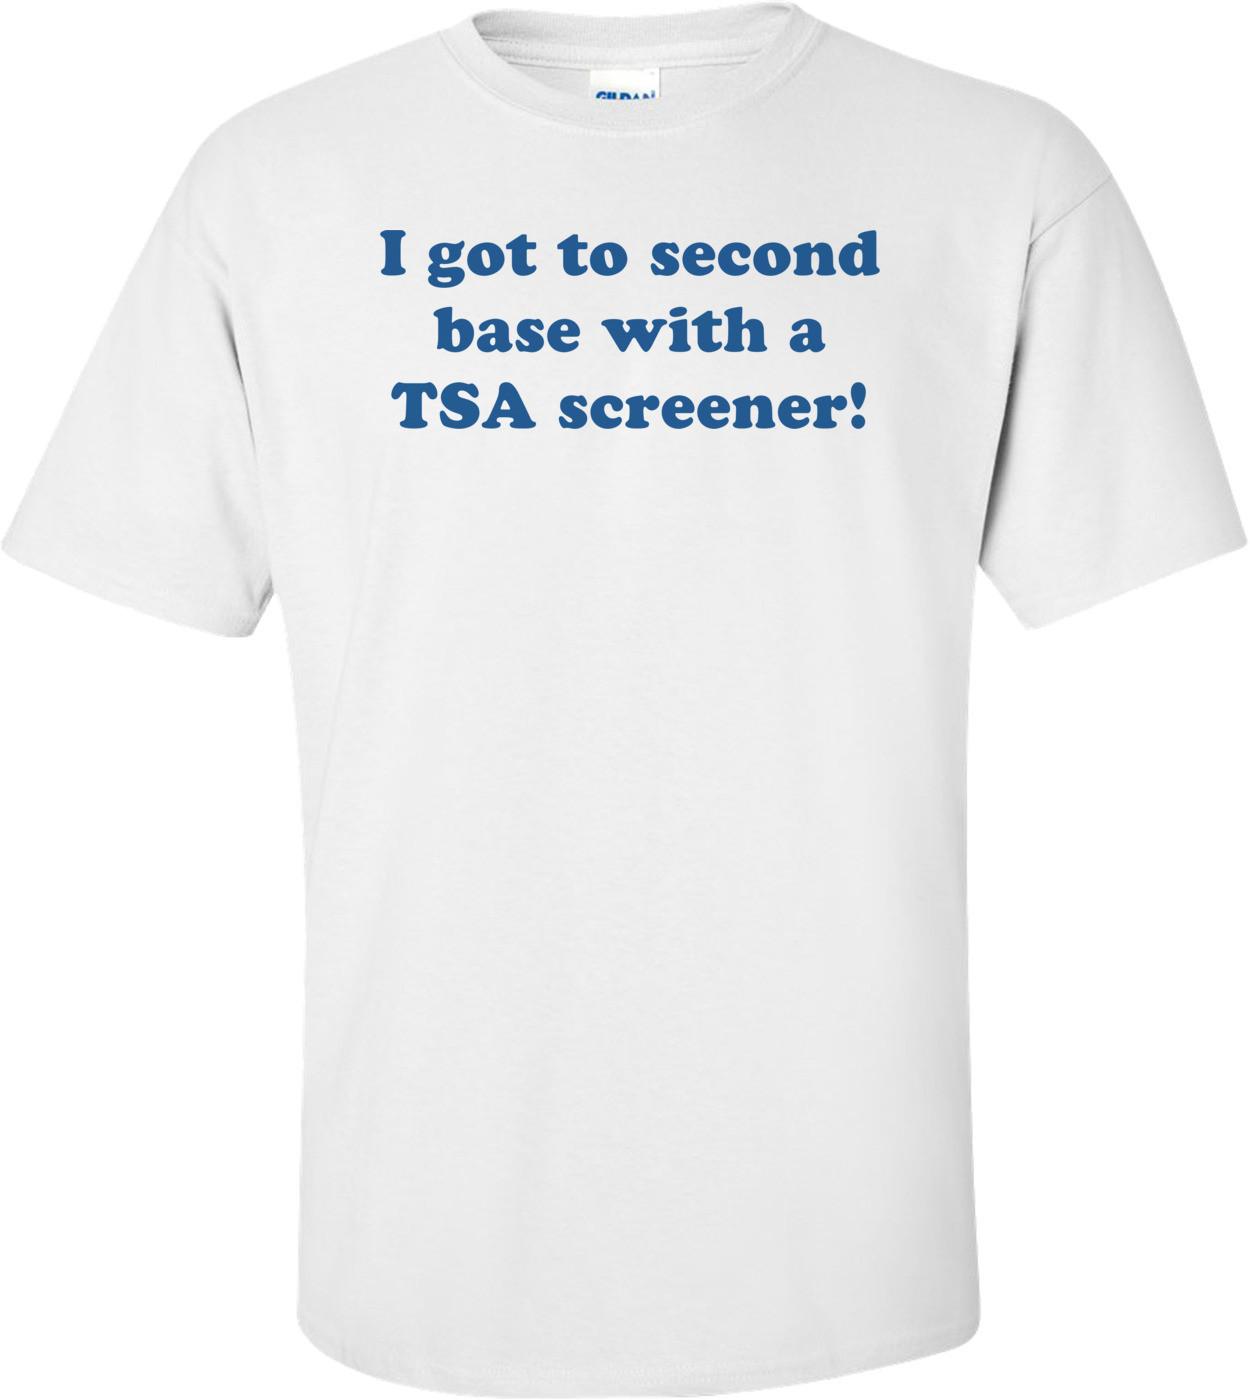 I got to second base with a TSA screener! Shirt